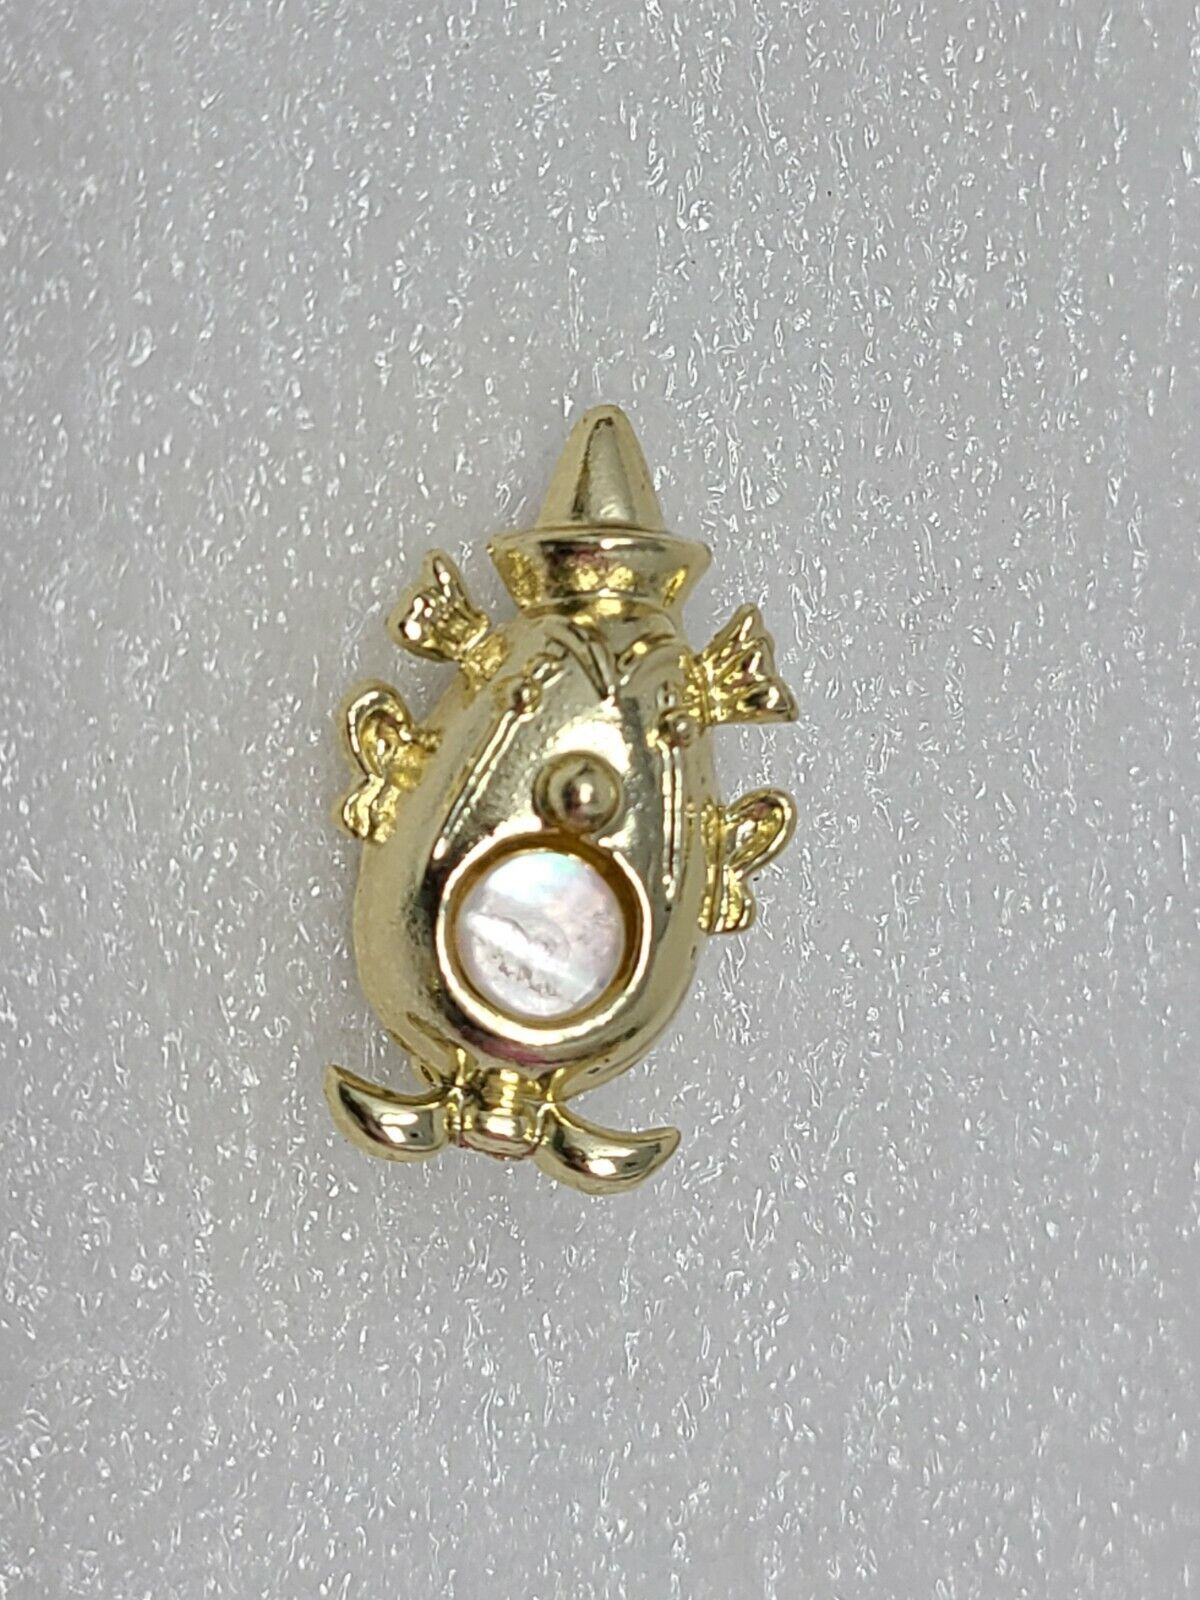 Vintage Novelty Lapel Pin Brooch Gold Tone - image 1